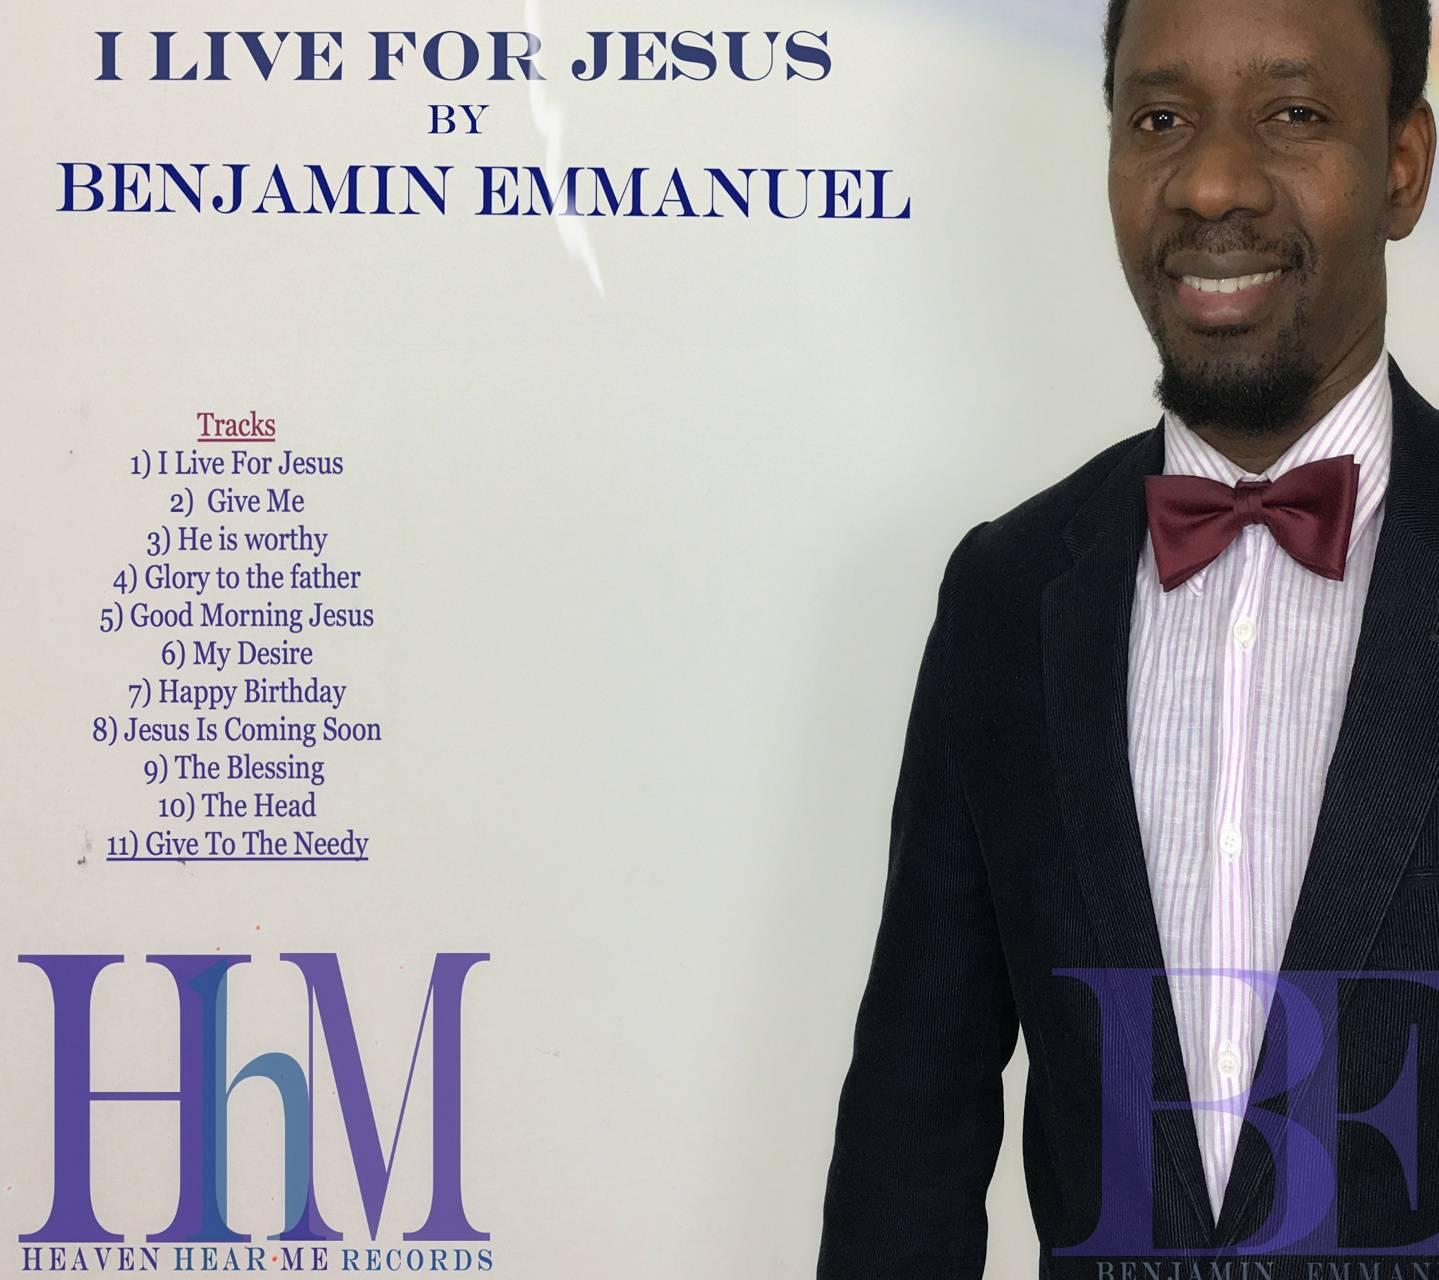 Benjamin Emmanuel